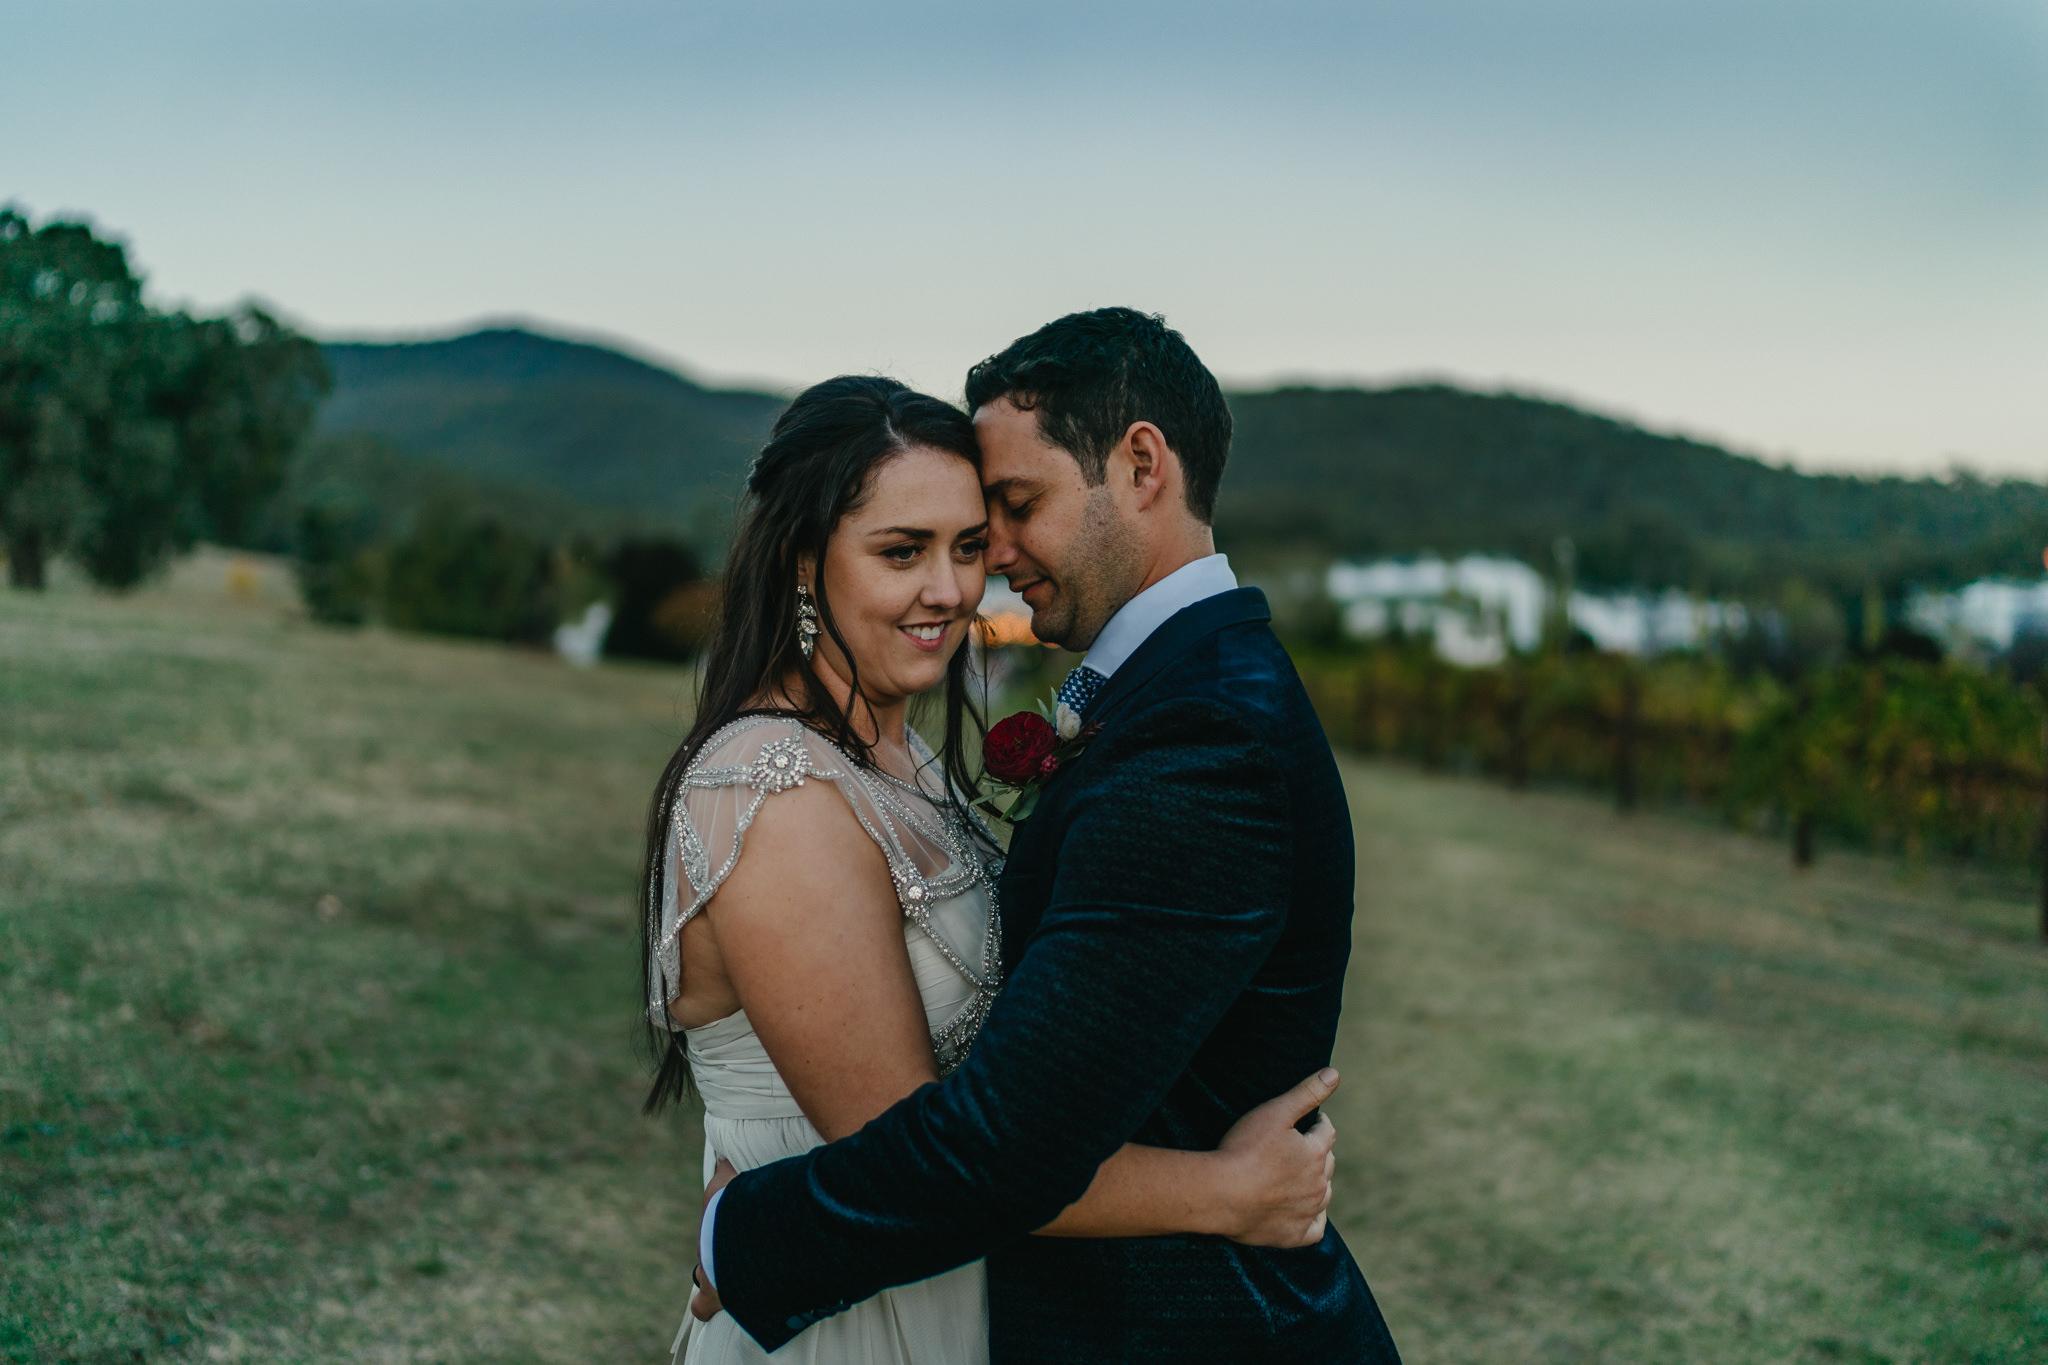 Camille & Liam_Wedding Day_Web Res_587.jpg